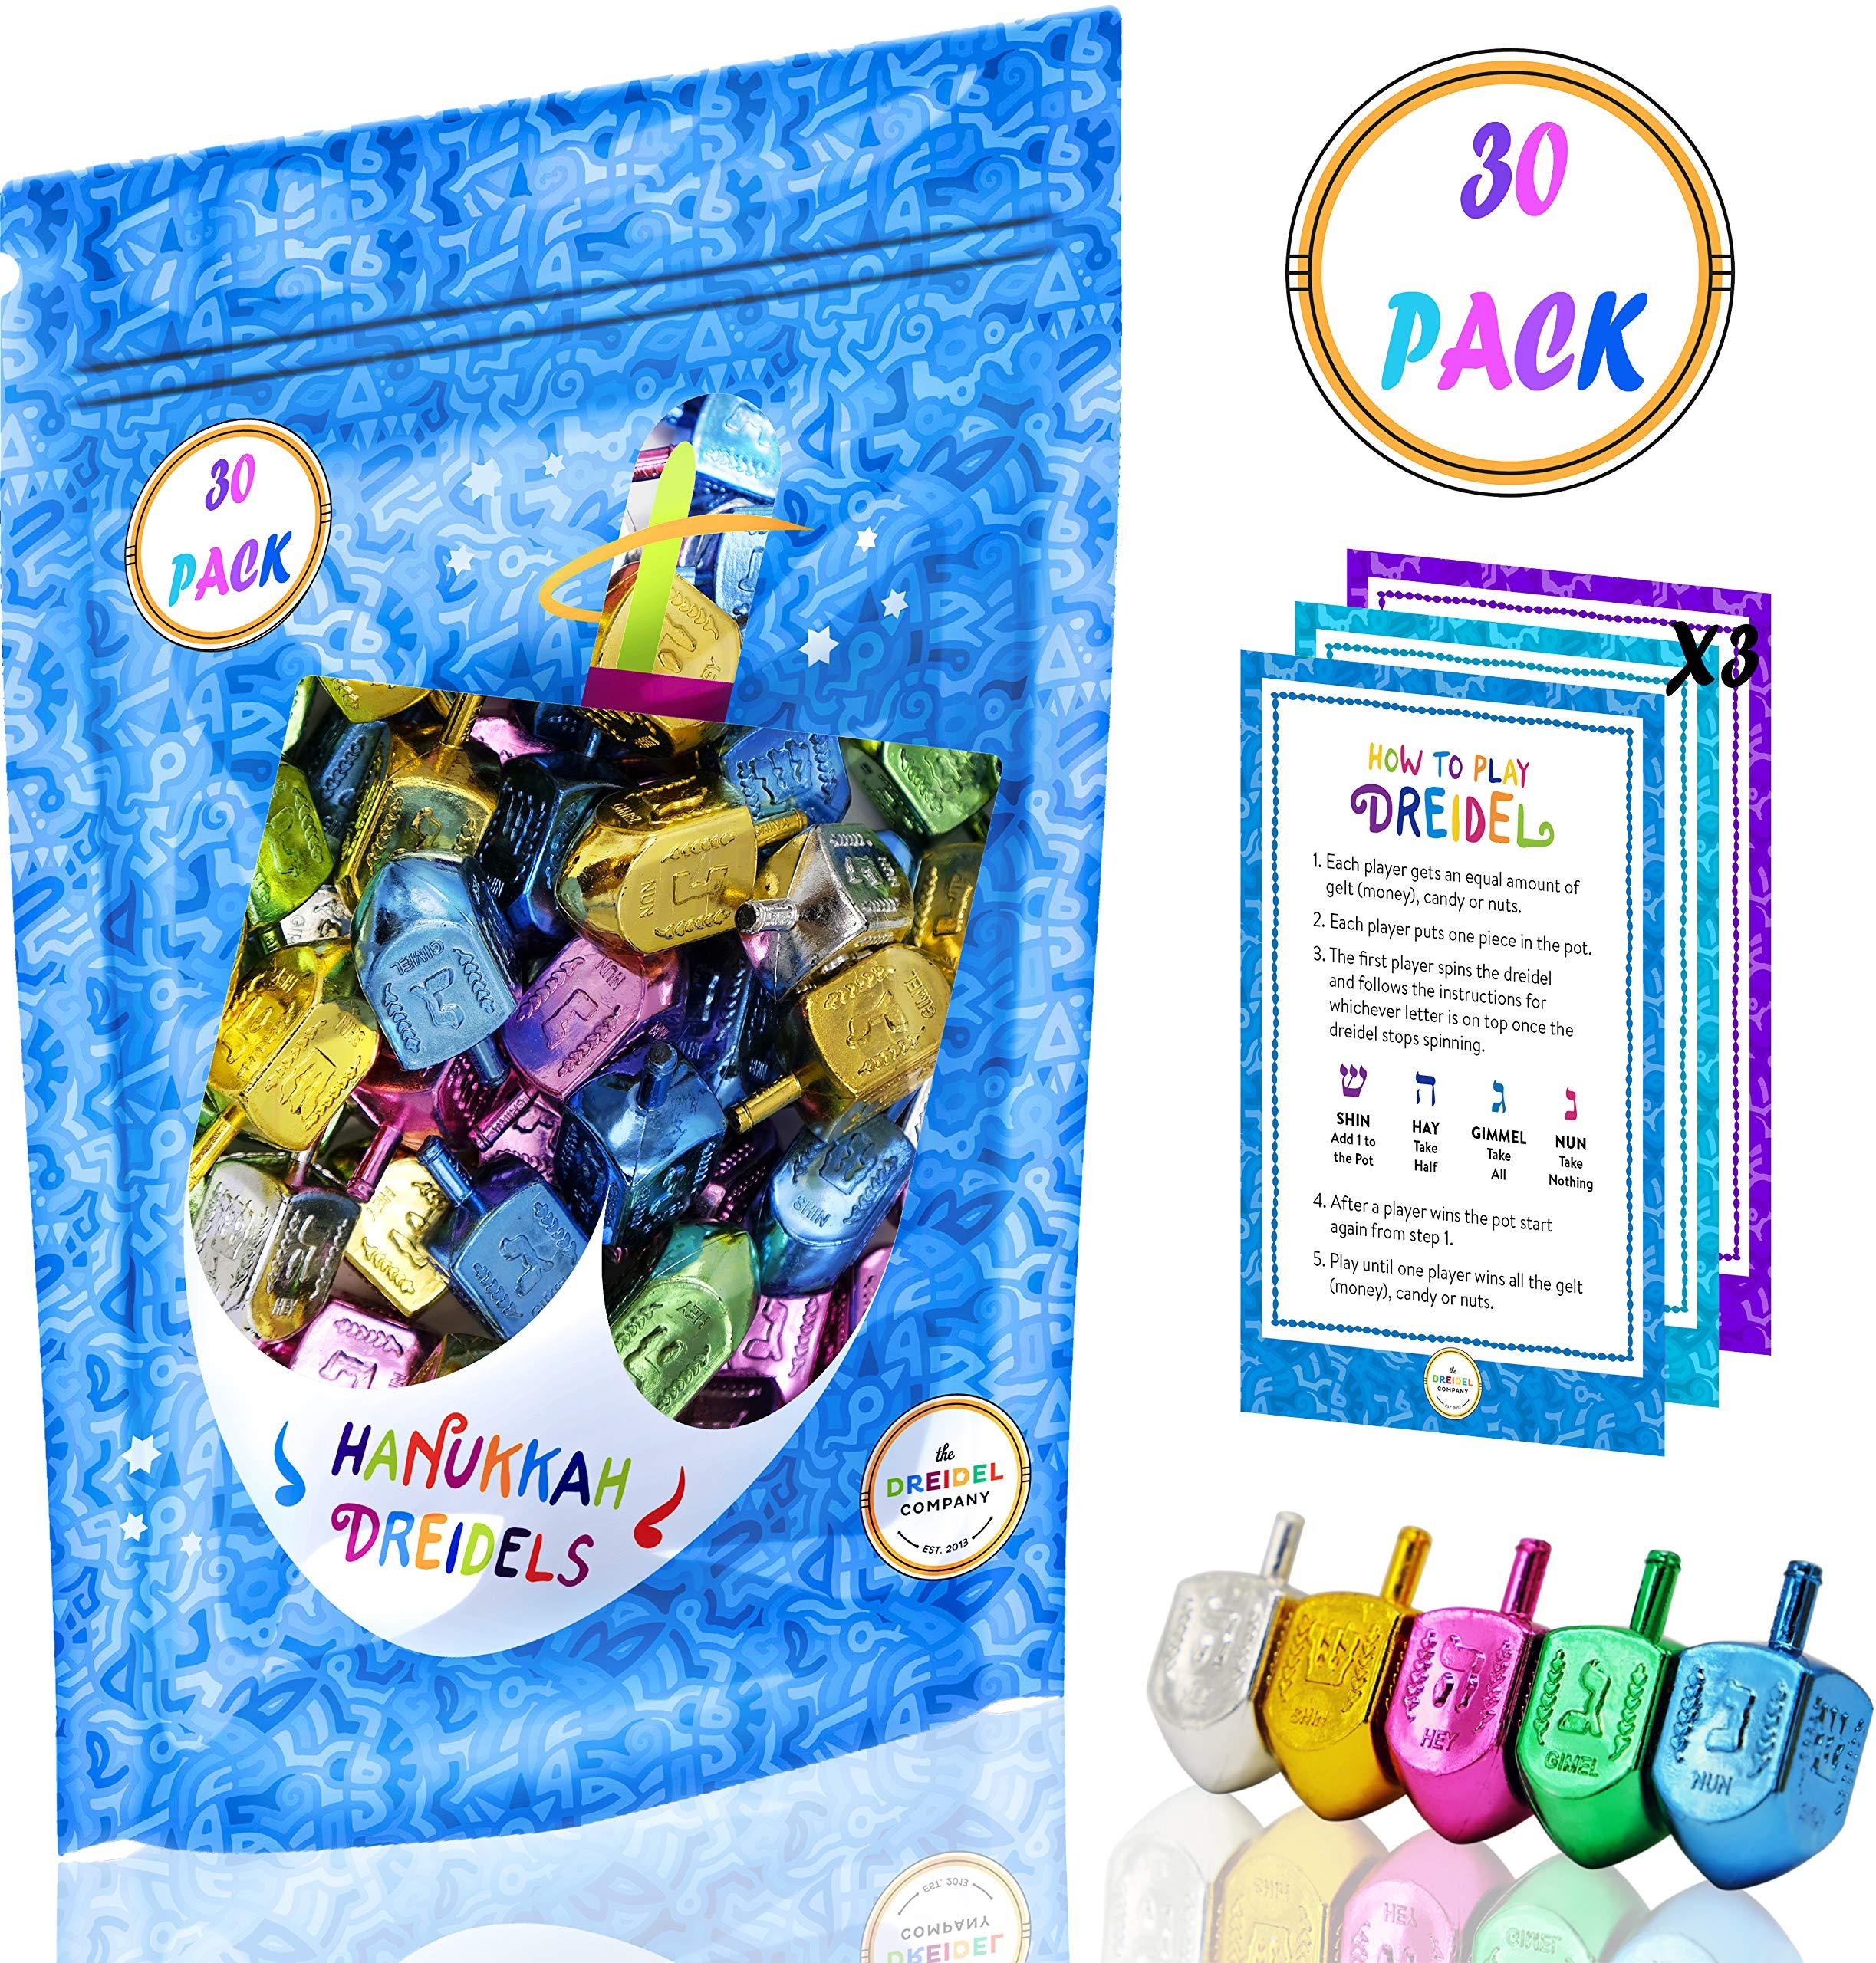 Hanukkah Dreidels Metallic Multi-Colored Draydels with English Translation - Includes 3 Dreidel Game Instruction Cards (30-Pack)